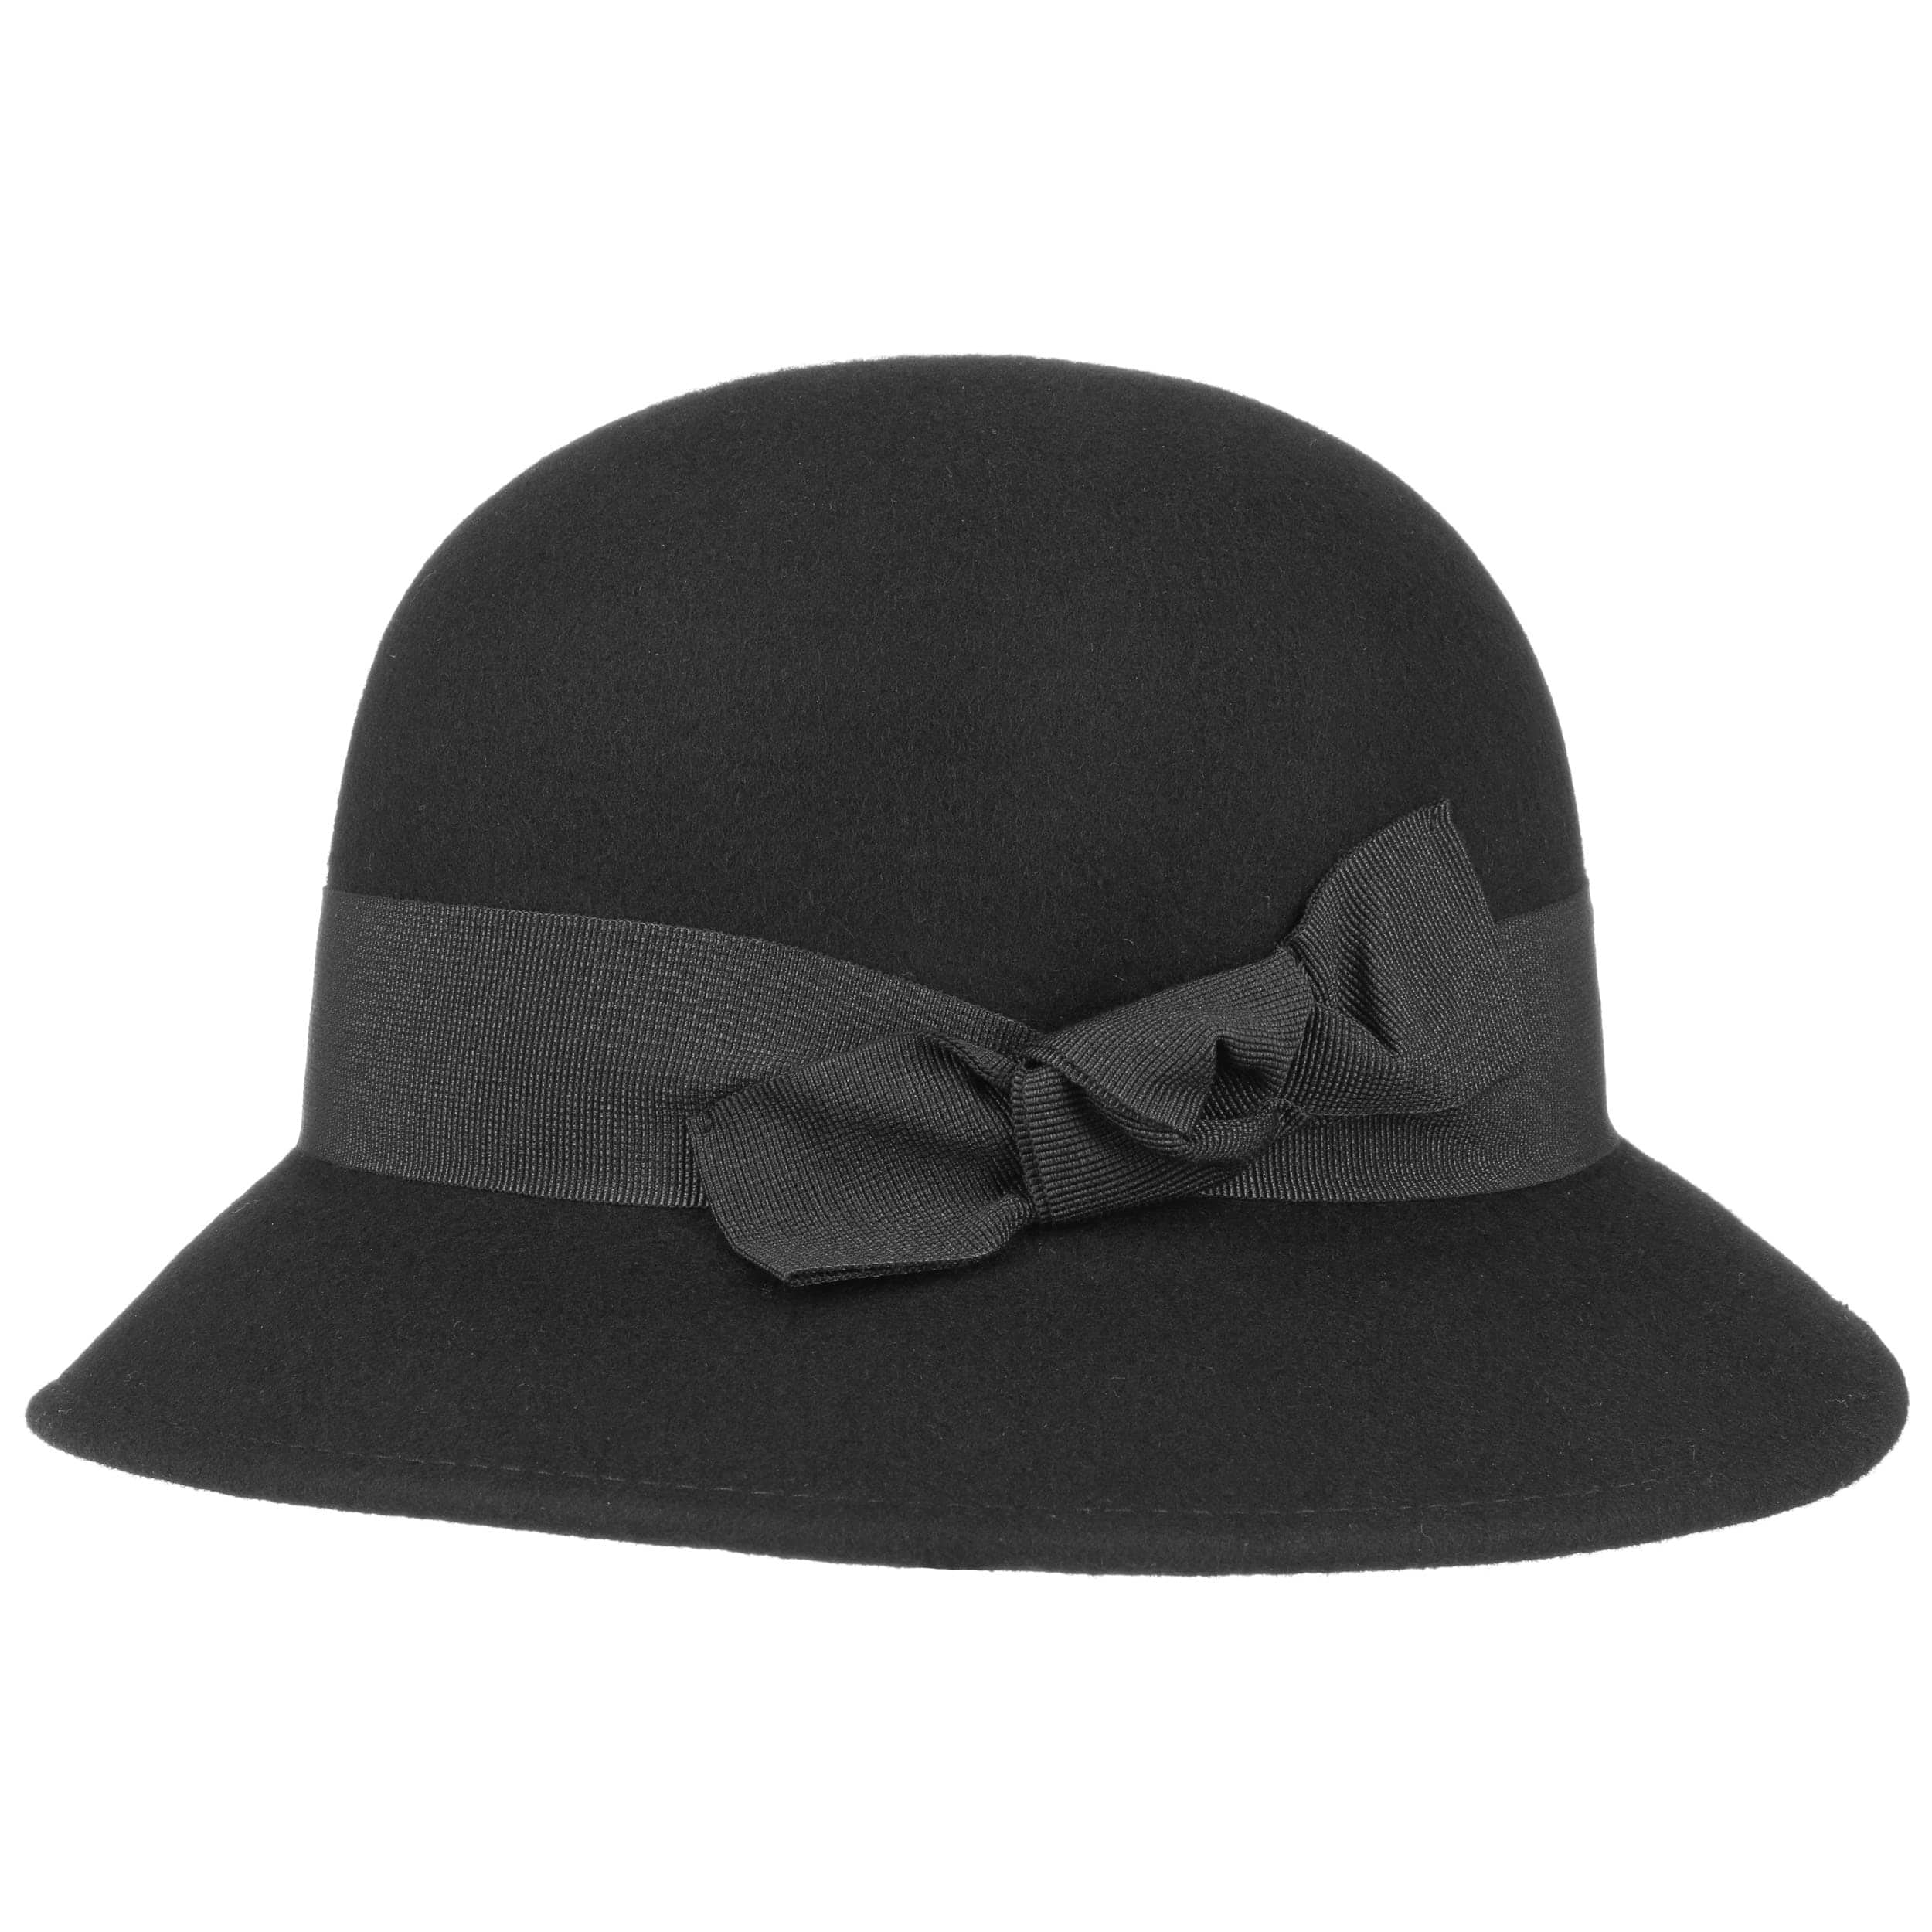 Felt Cloche Hat with Knit Brim by Lierys Floppy hats Lierys angEvSutE